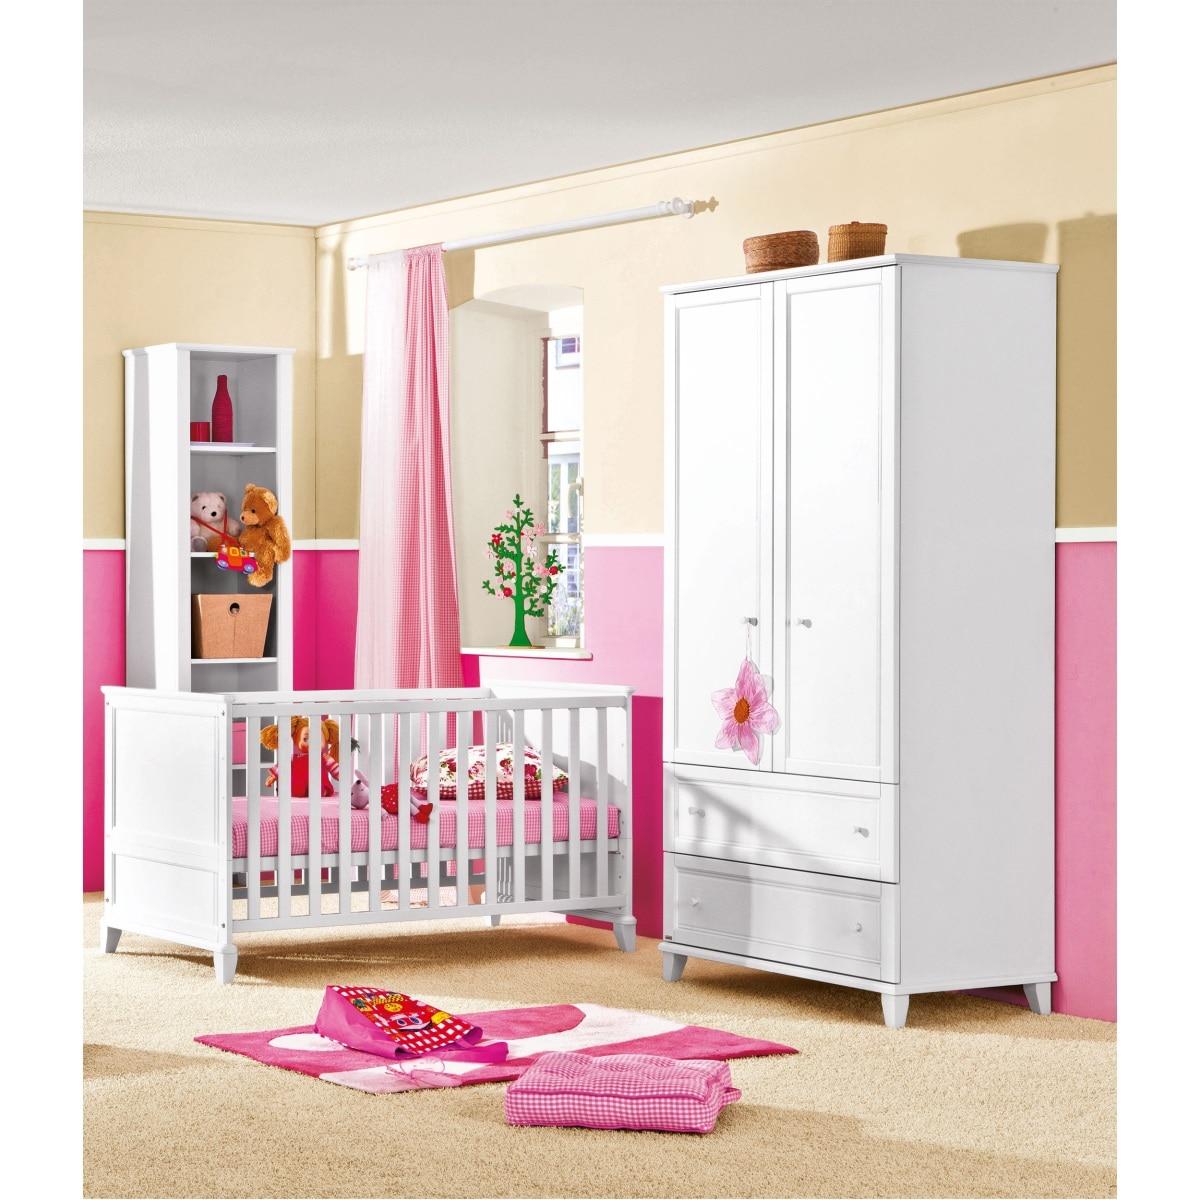 Kinderbett In Icy White Ca 70 X 140 Cm Porta Null